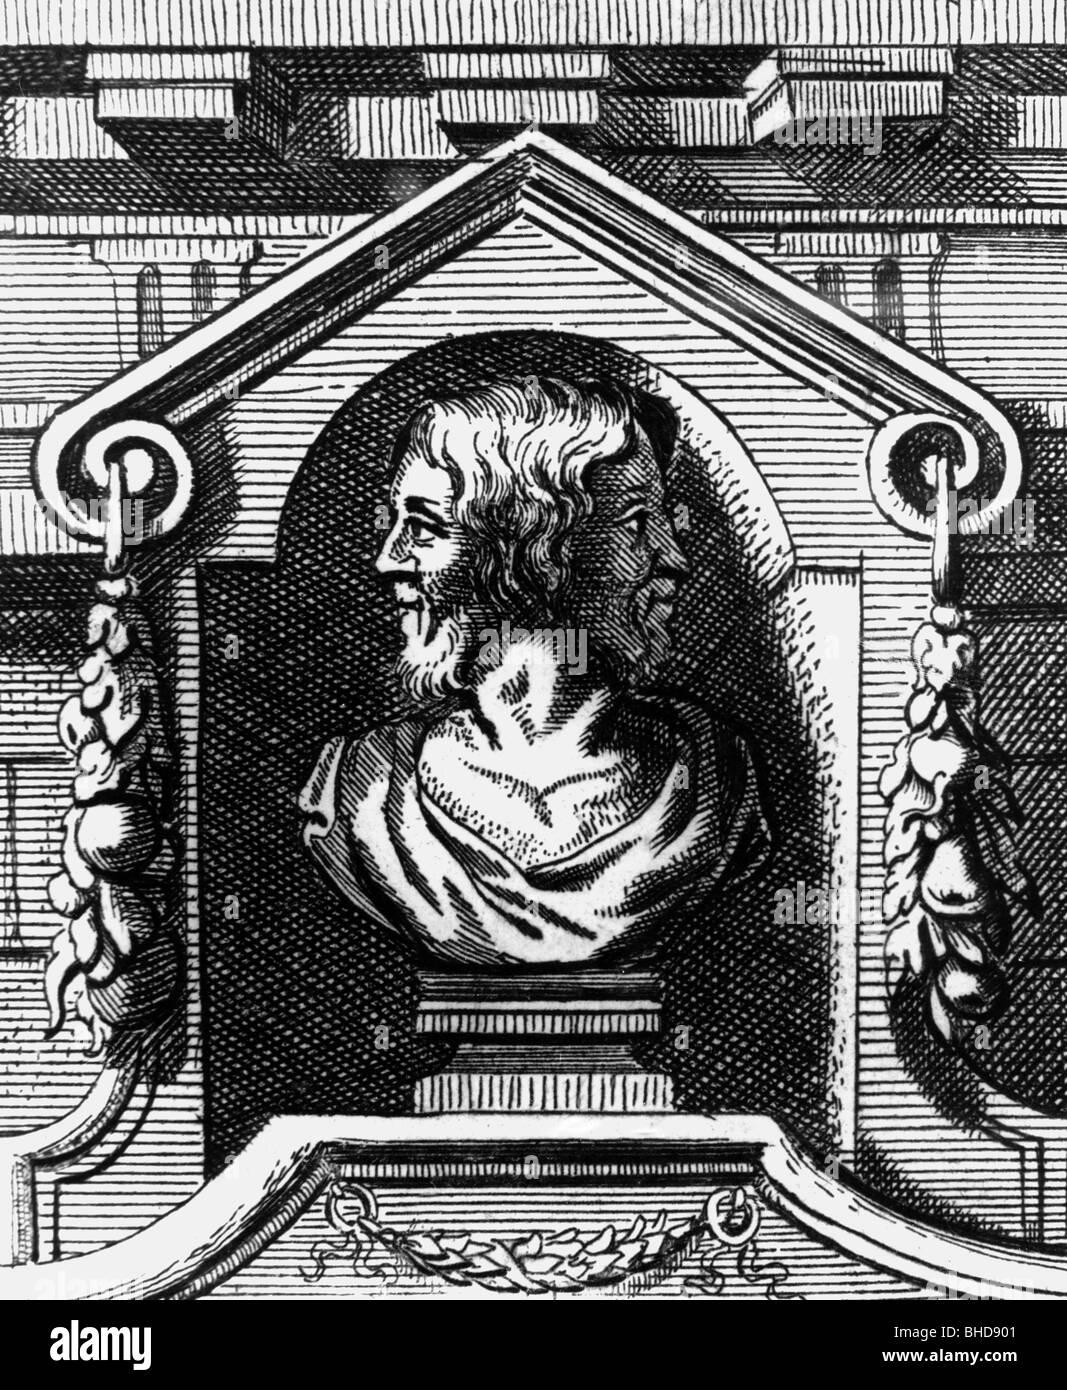 Janus, Roman god of gates, doors, doorways, beginnings and endings, copper engraving by Gasparone Bouttats, detail - Stock Image